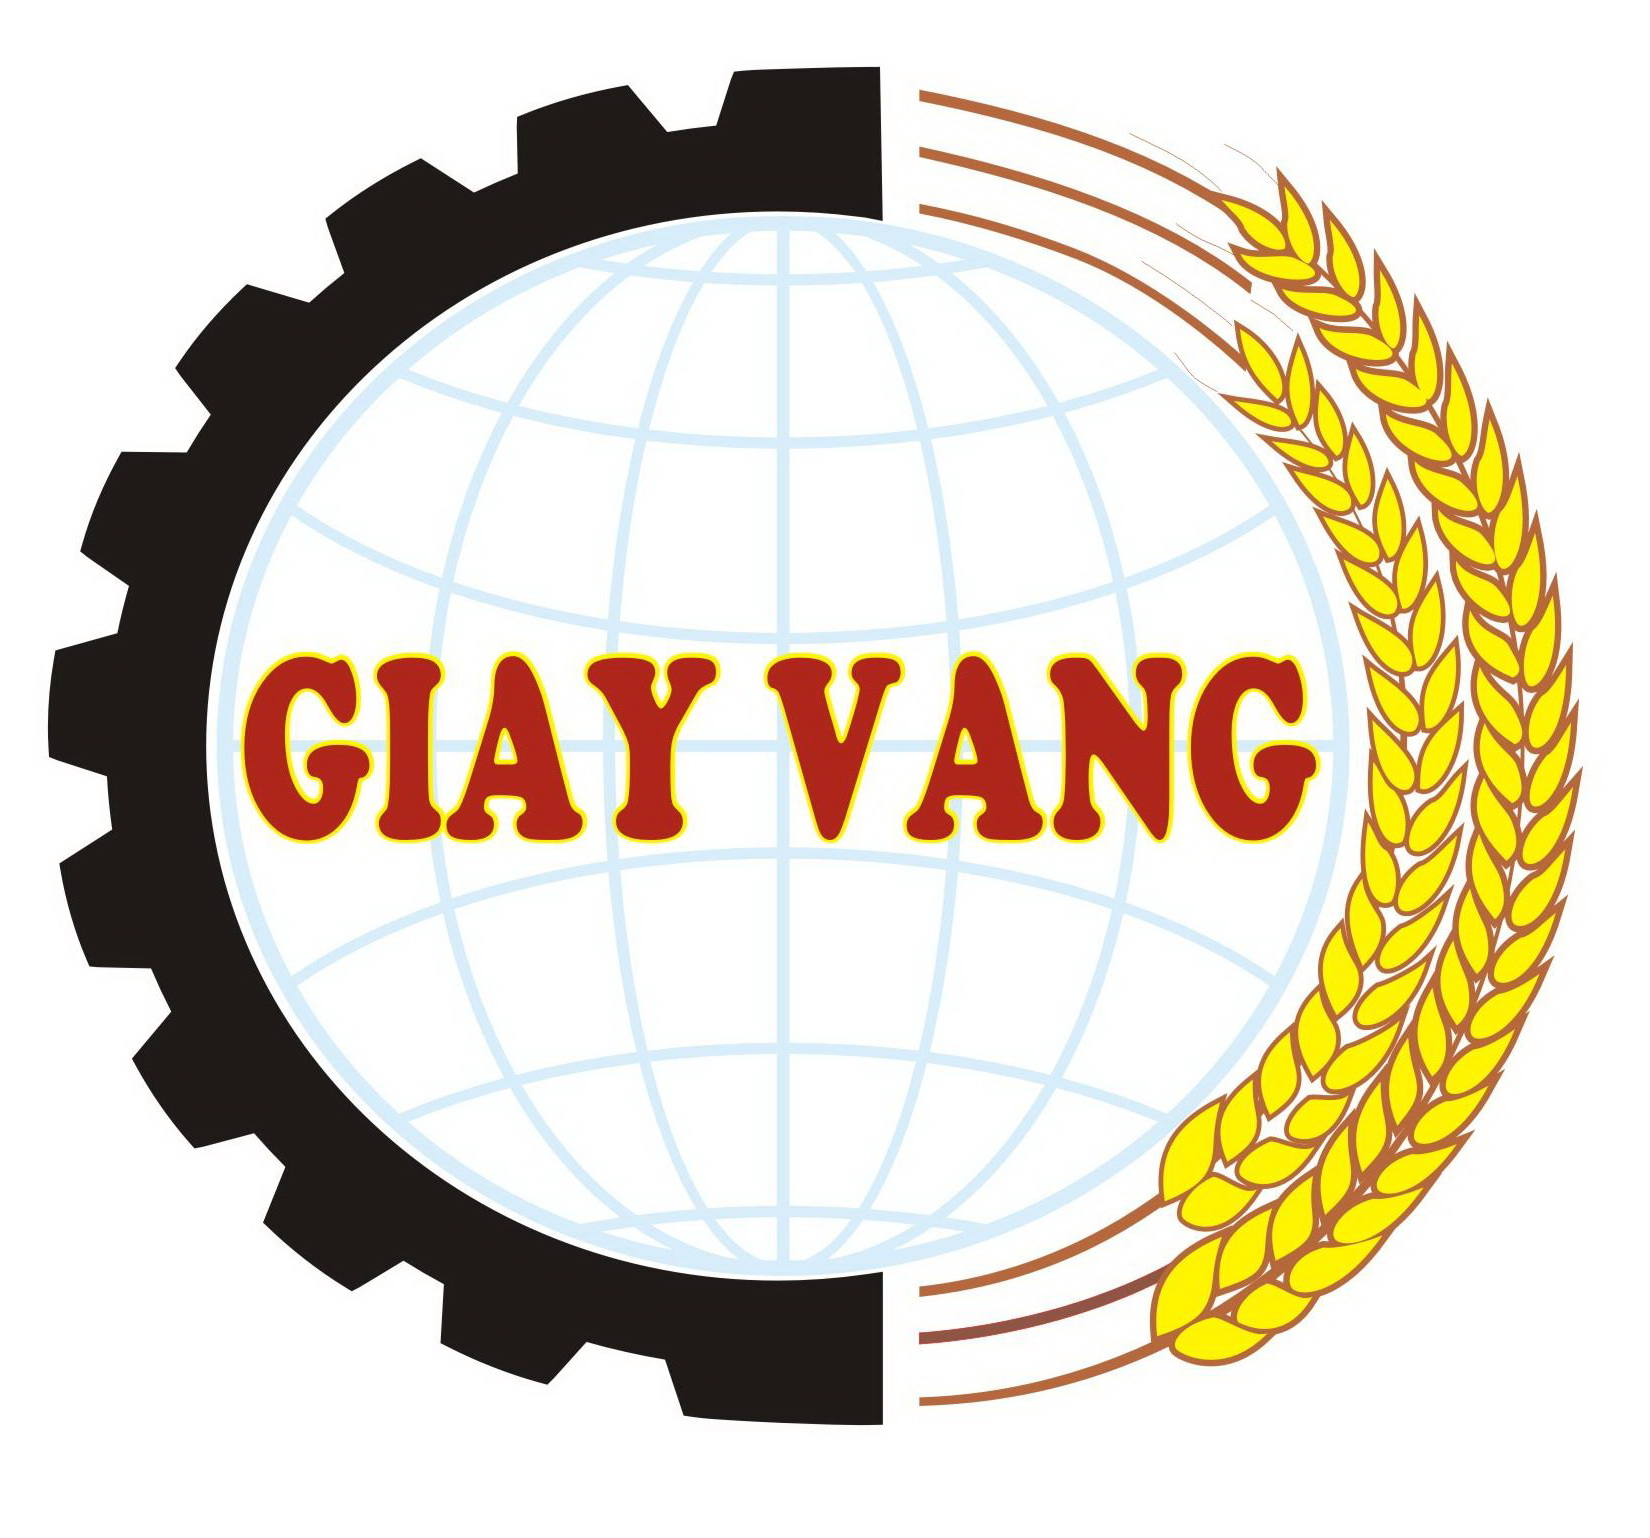 GIAY VANG